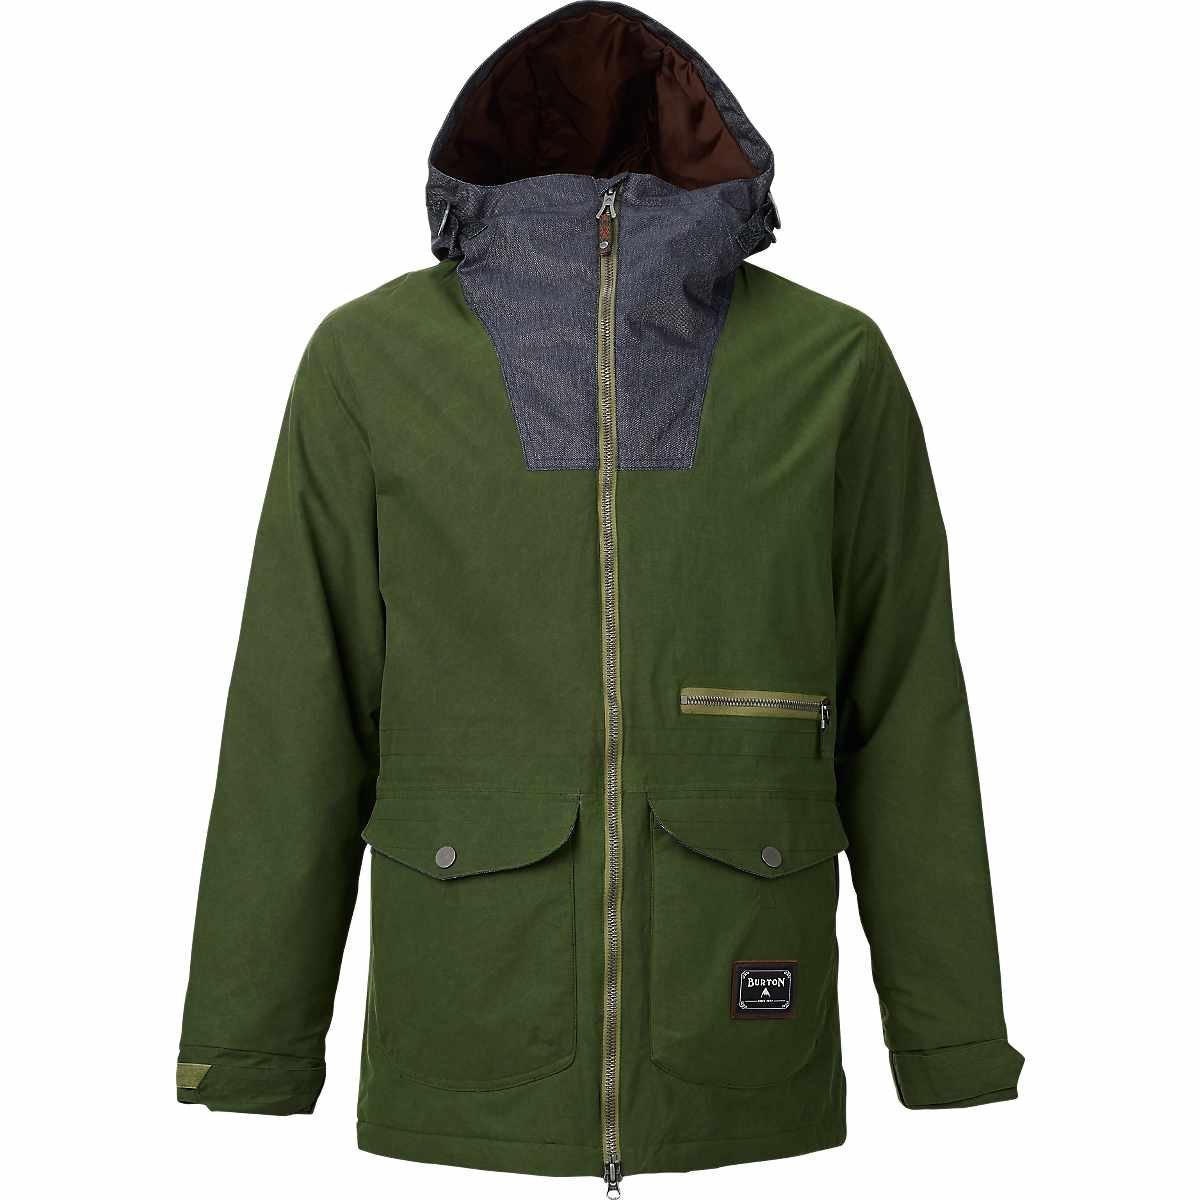 burton cambridge jacket winter 2016 g nstig kaufen. Black Bedroom Furniture Sets. Home Design Ideas